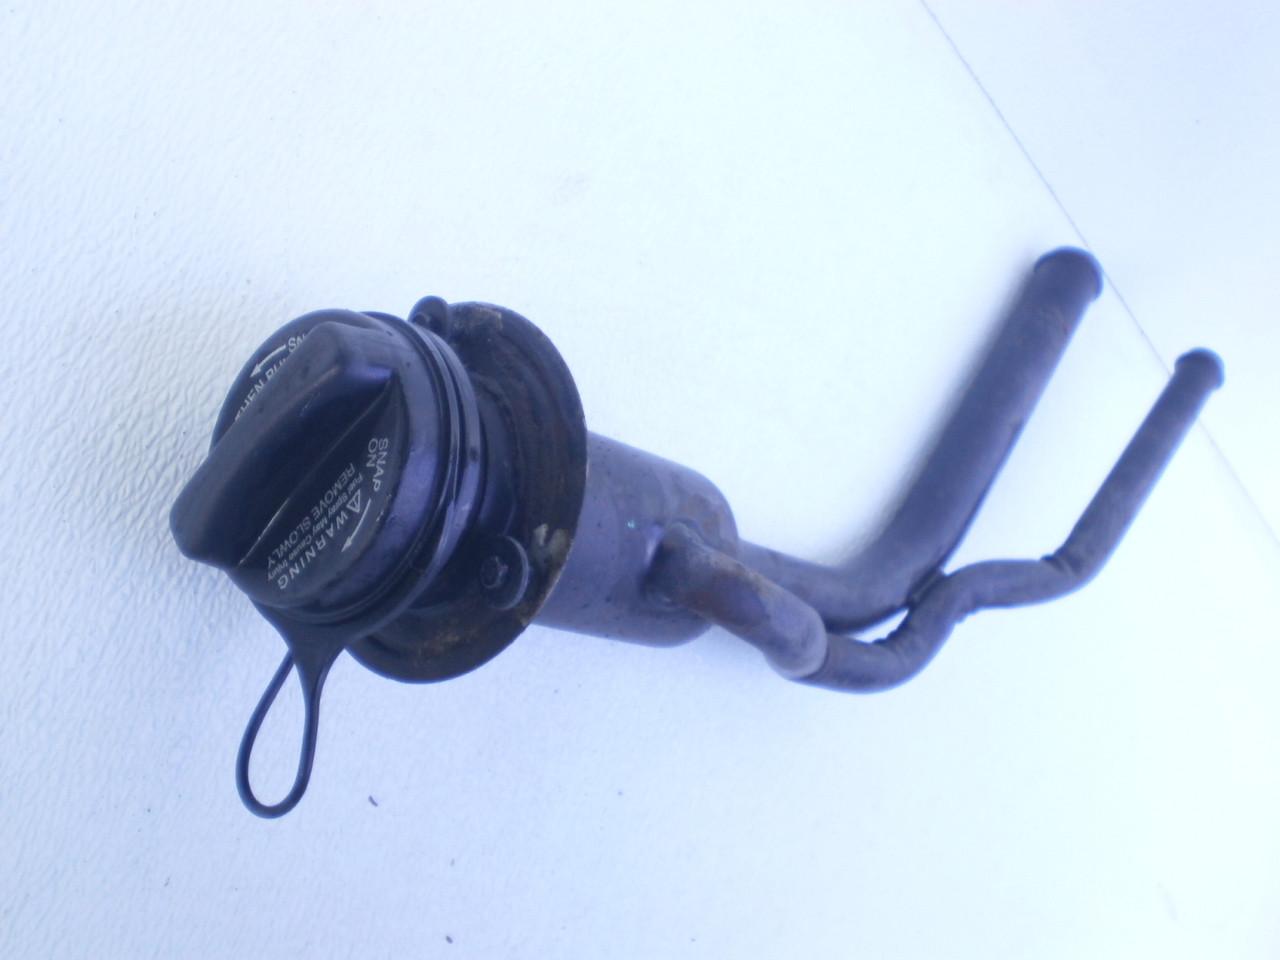 1997-2001 Ford Explorer Mercury Mountaineer Fuel Tank Gas Filler Neck Tubes  Cap XL2Z-9034-CA